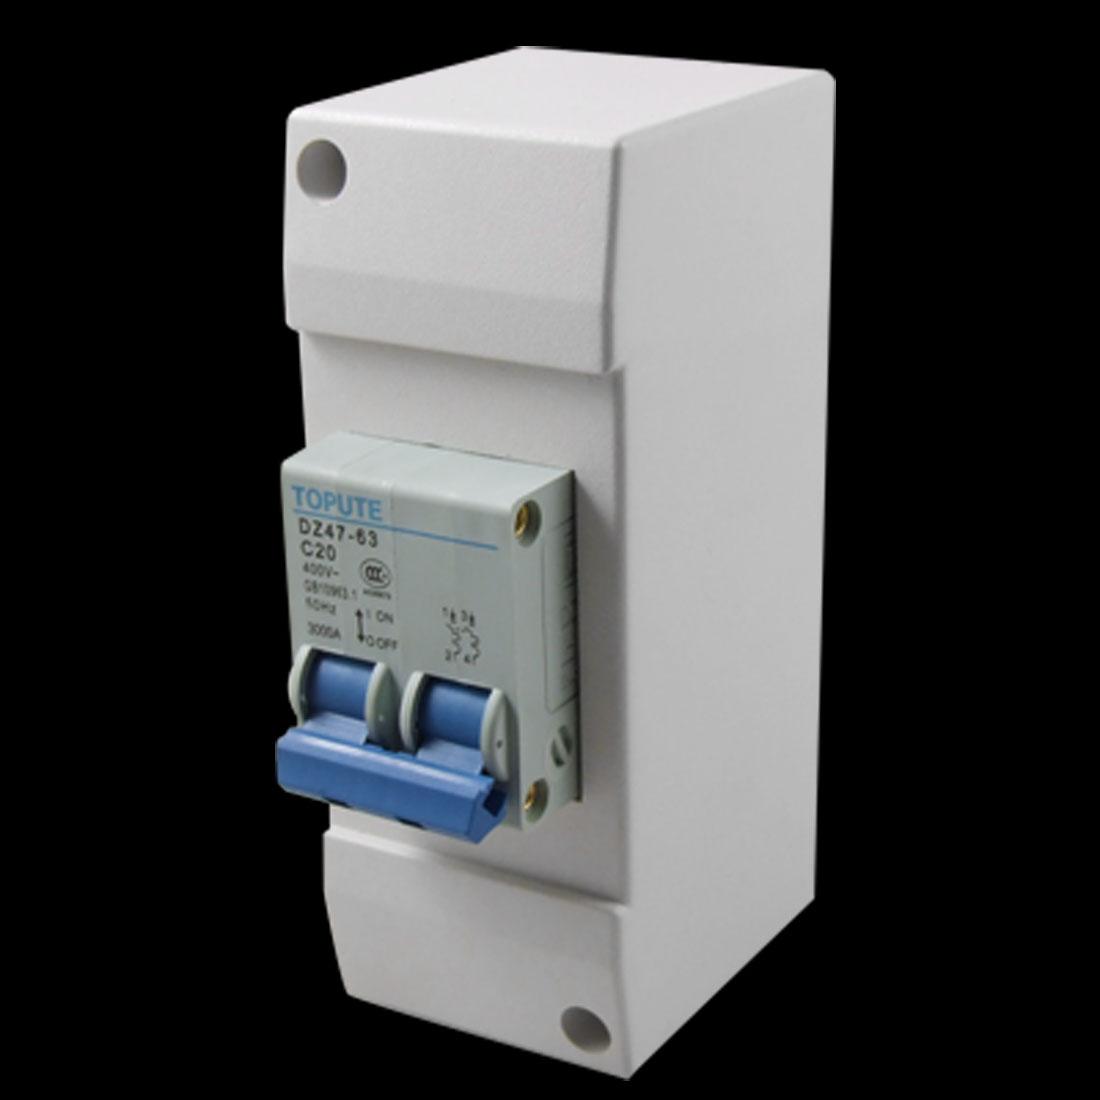 AC 400V 20A 2 Pole Gray Plastic Casing Miniature MCB Circuit Breaker